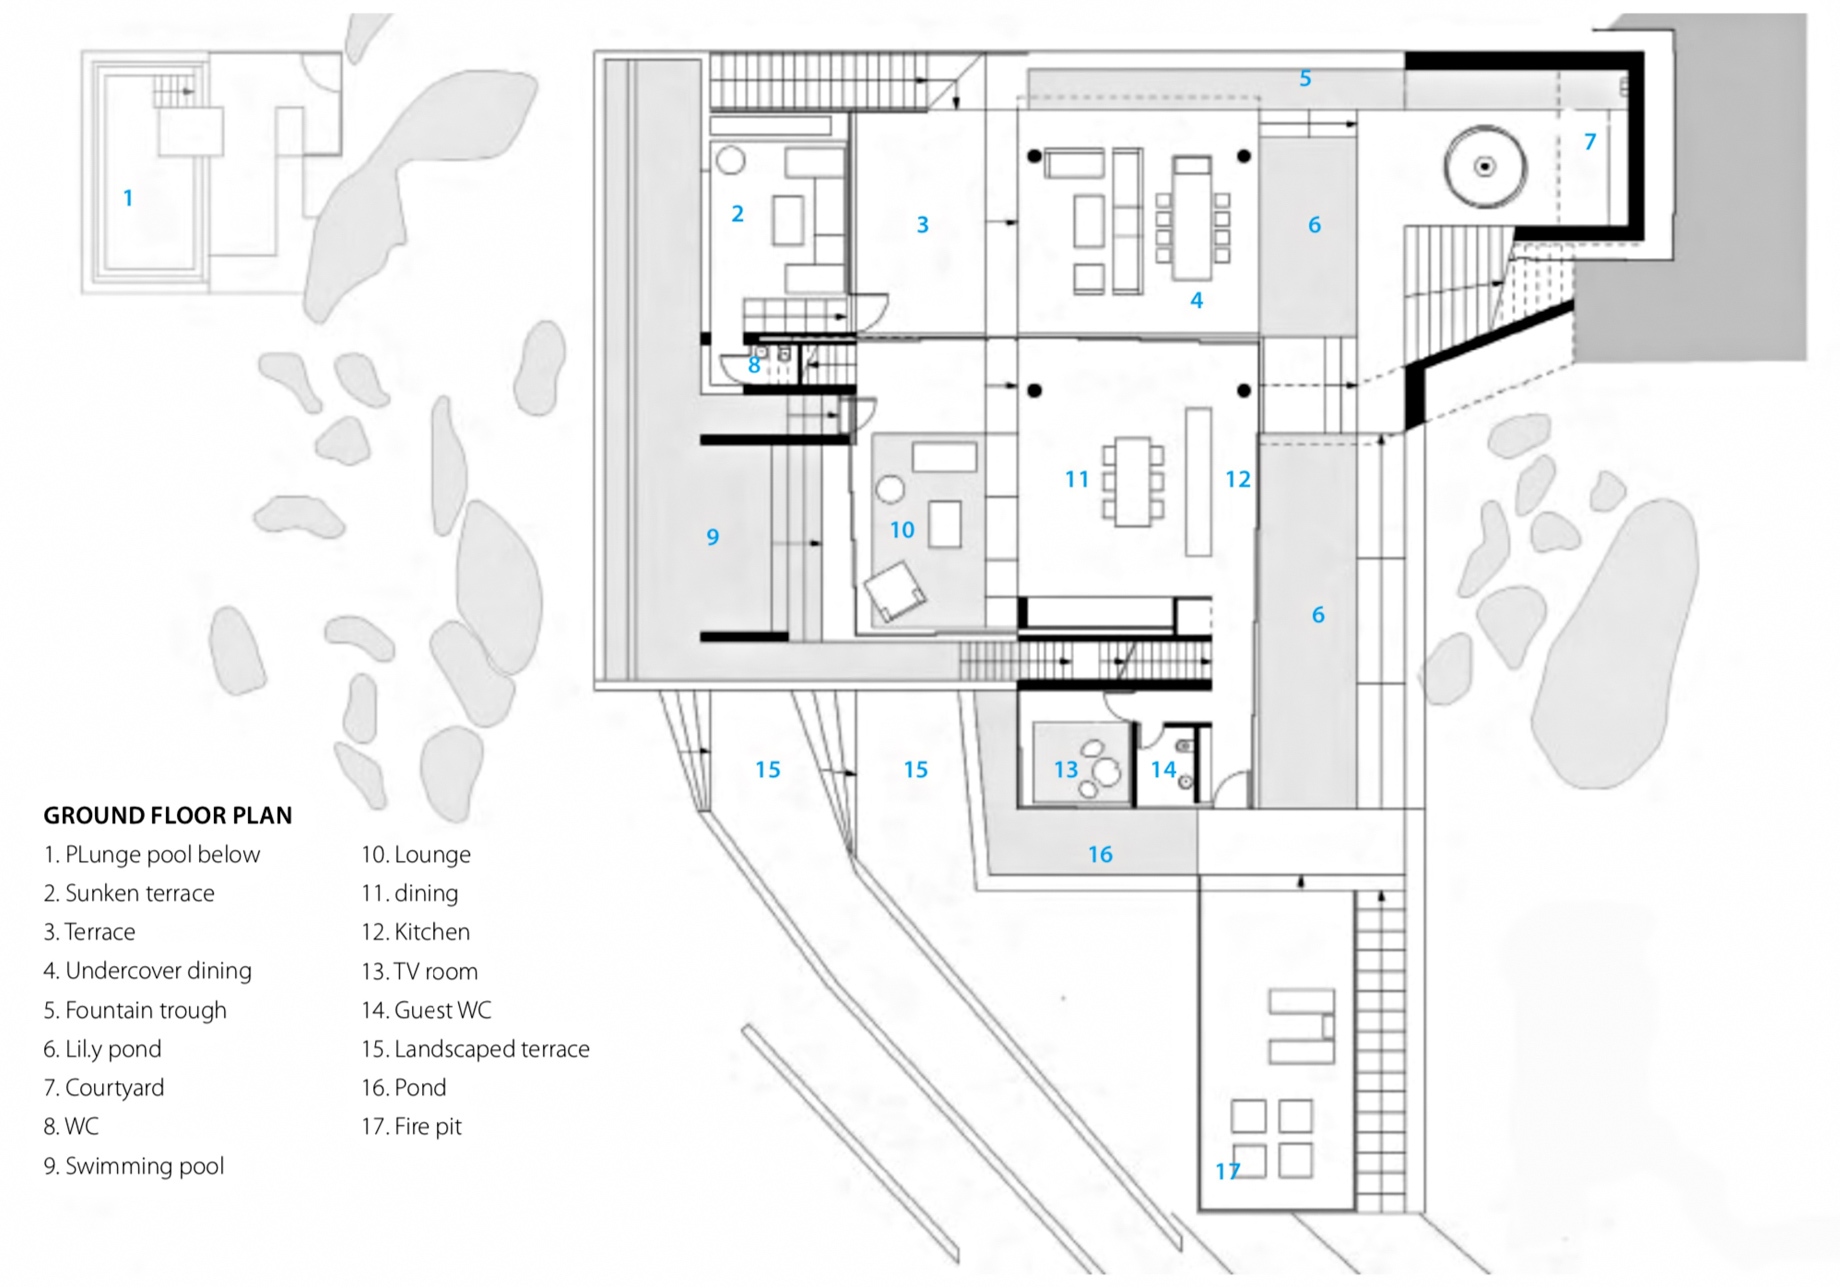 Ground Floor Plan - Solis Hamilton Island House - Whitsundays, Queensland, Australia